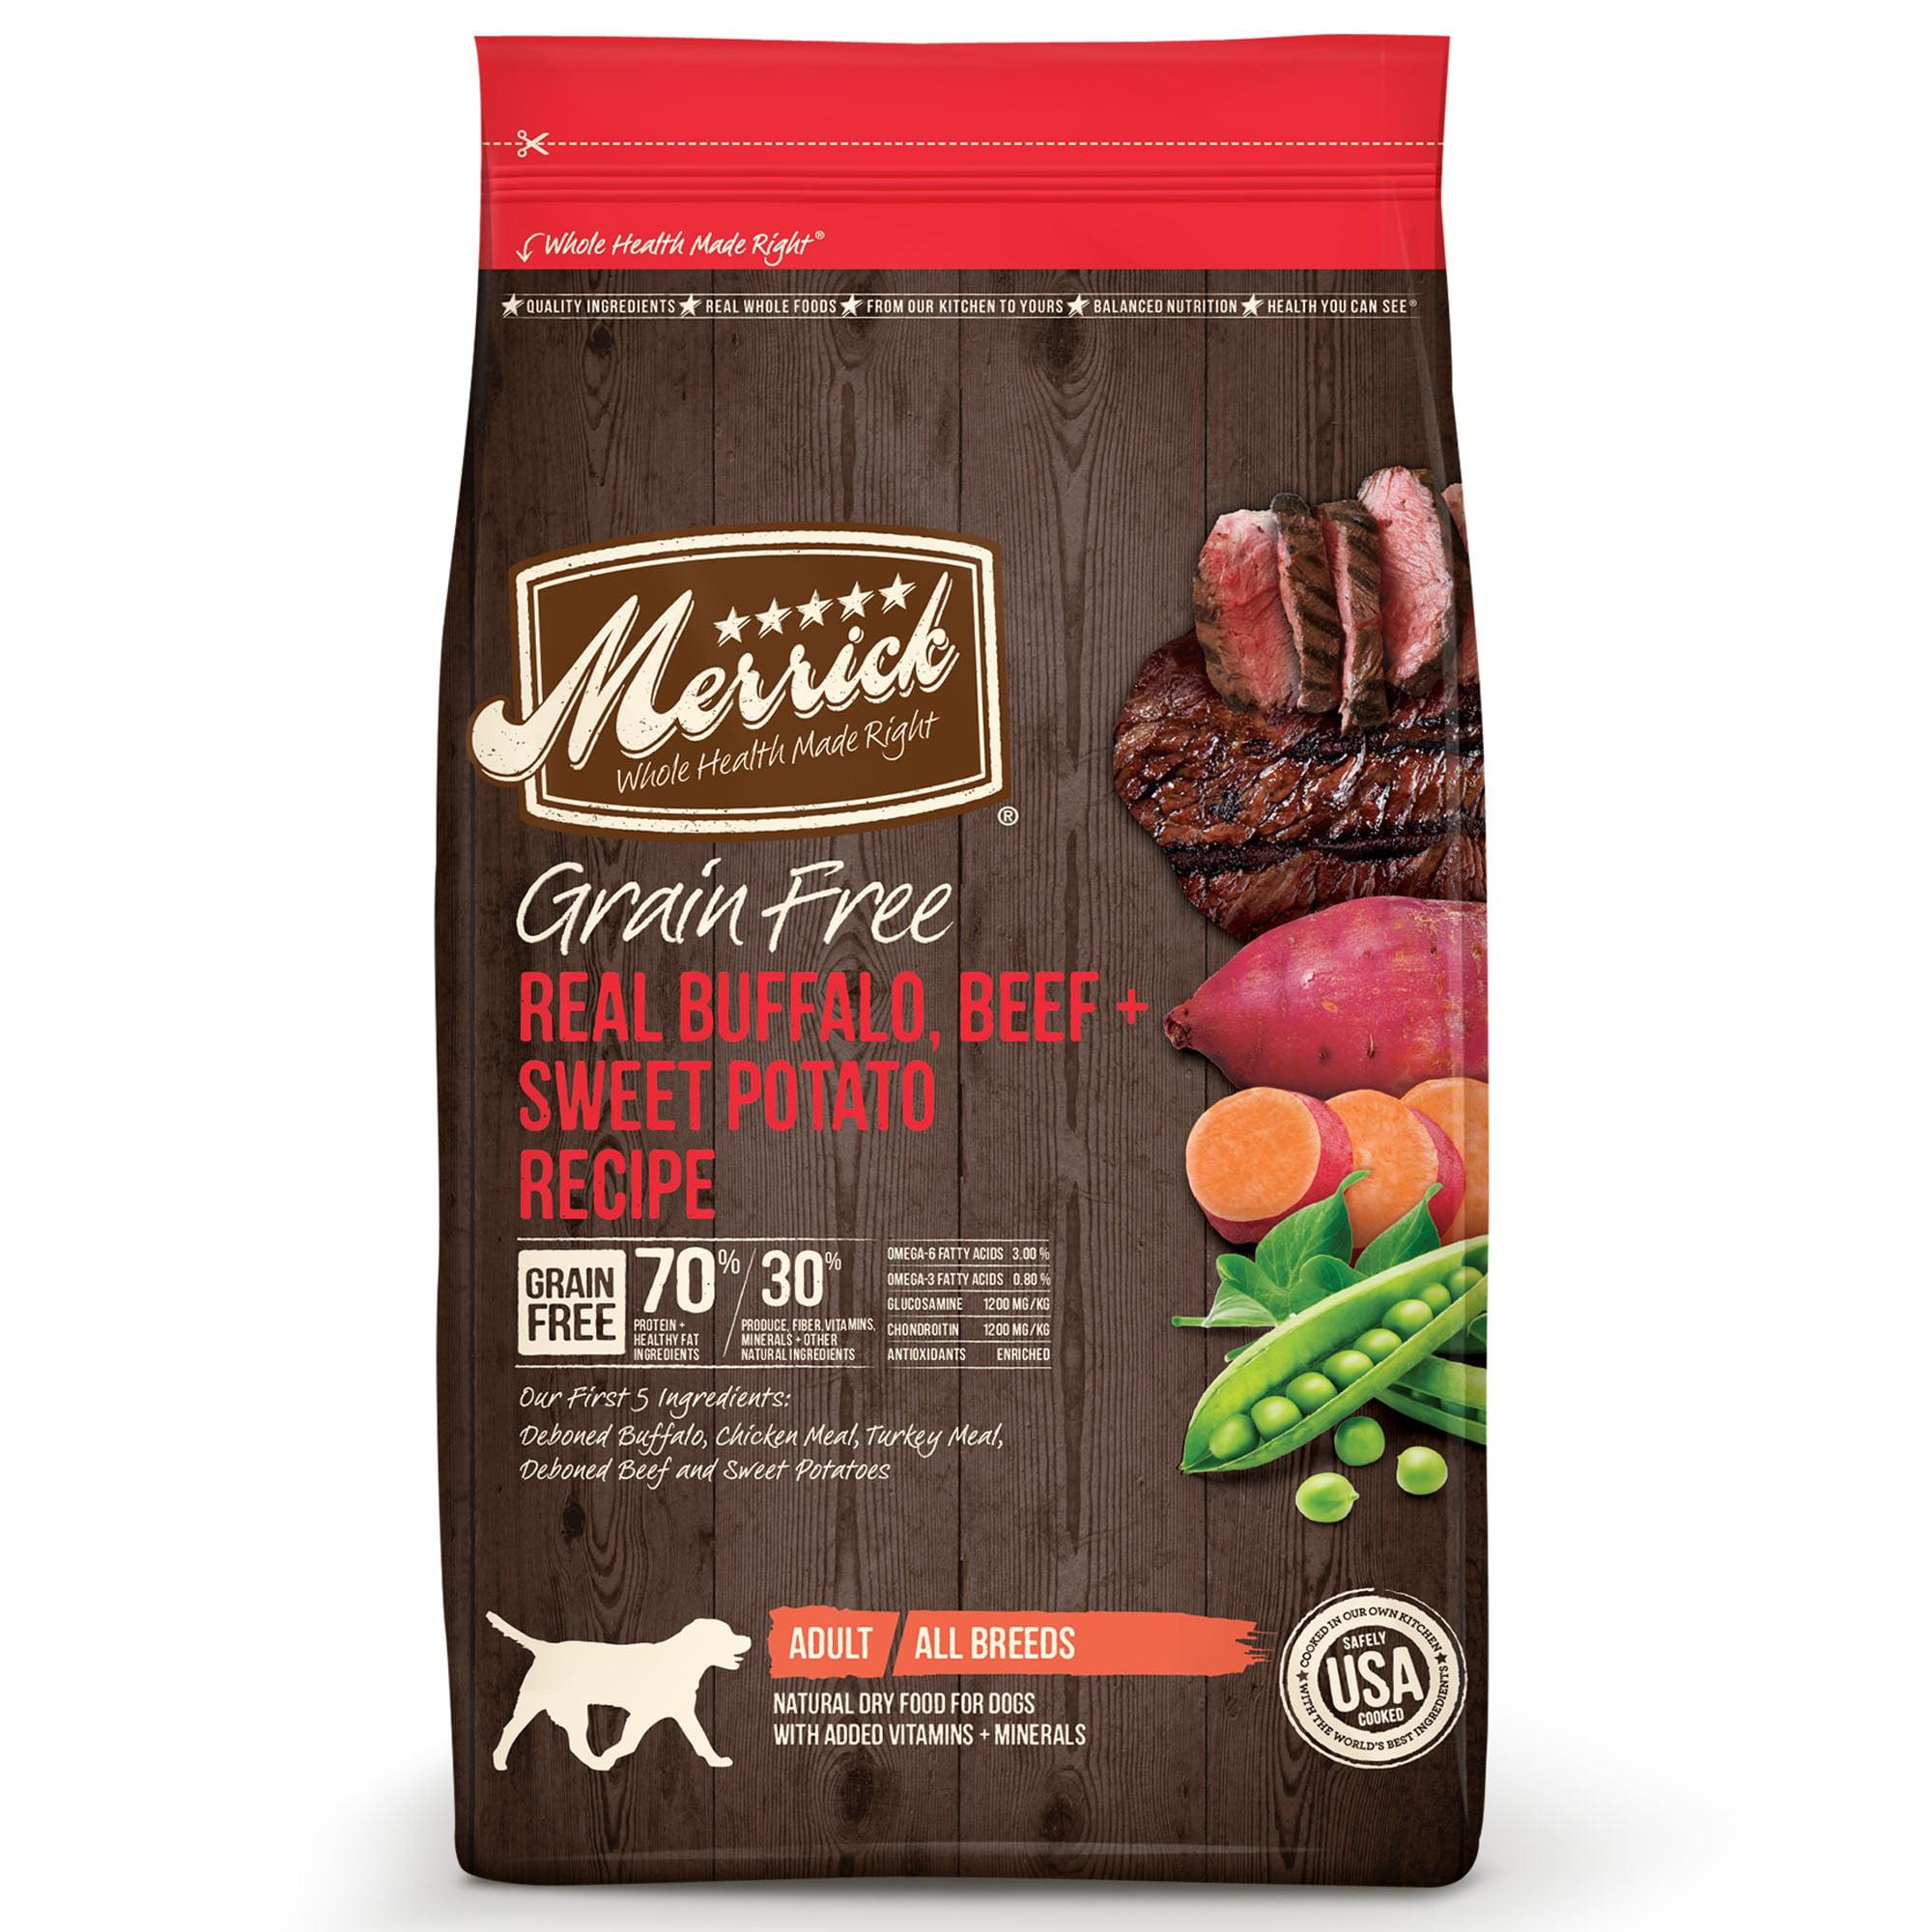 Merrick Grain-Free Real Buffalo, Beef & Sweet Potato Recipe Dry Dog Food, 22 Lb